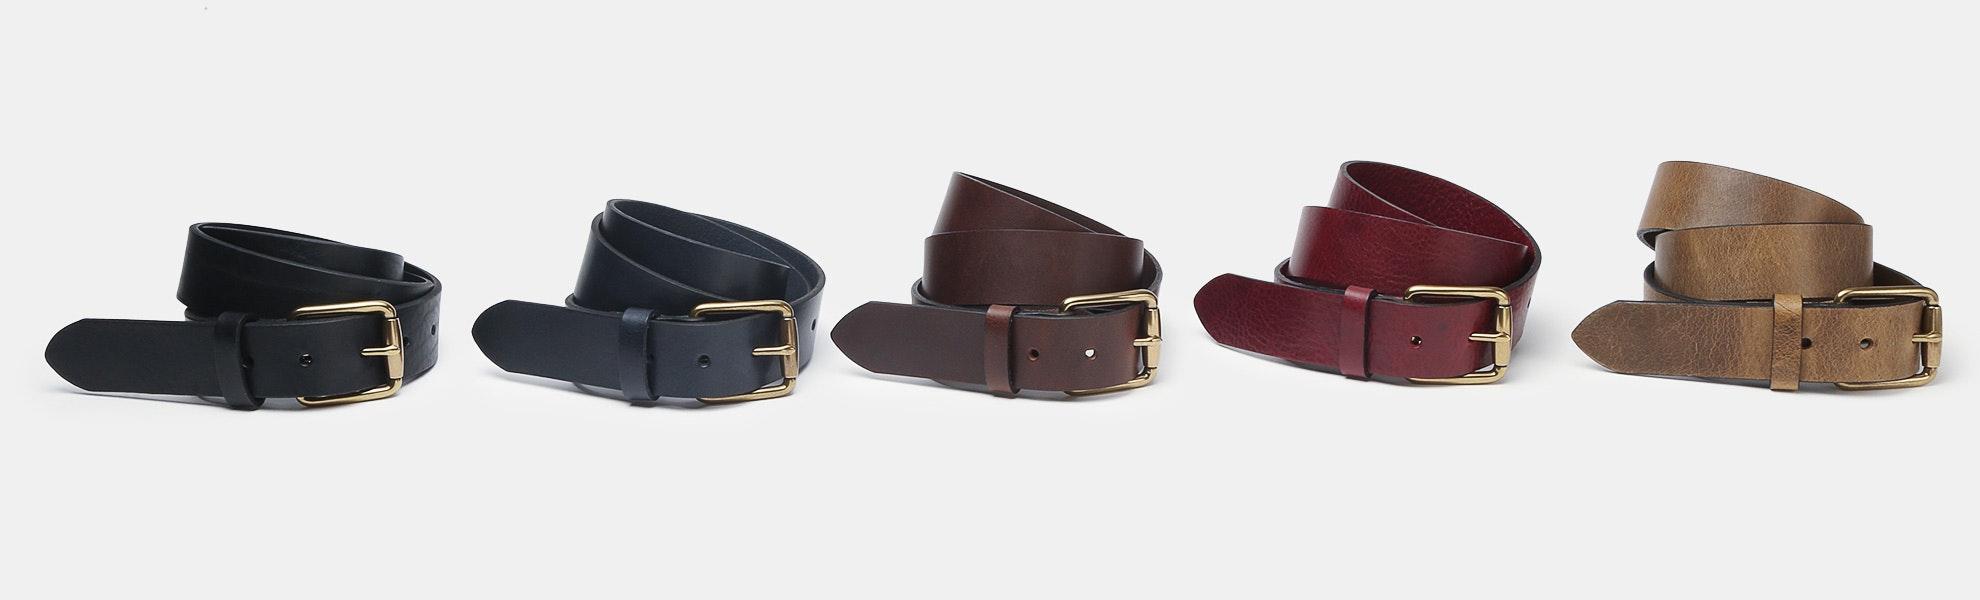 The British Belt Co. Bradgate Belt